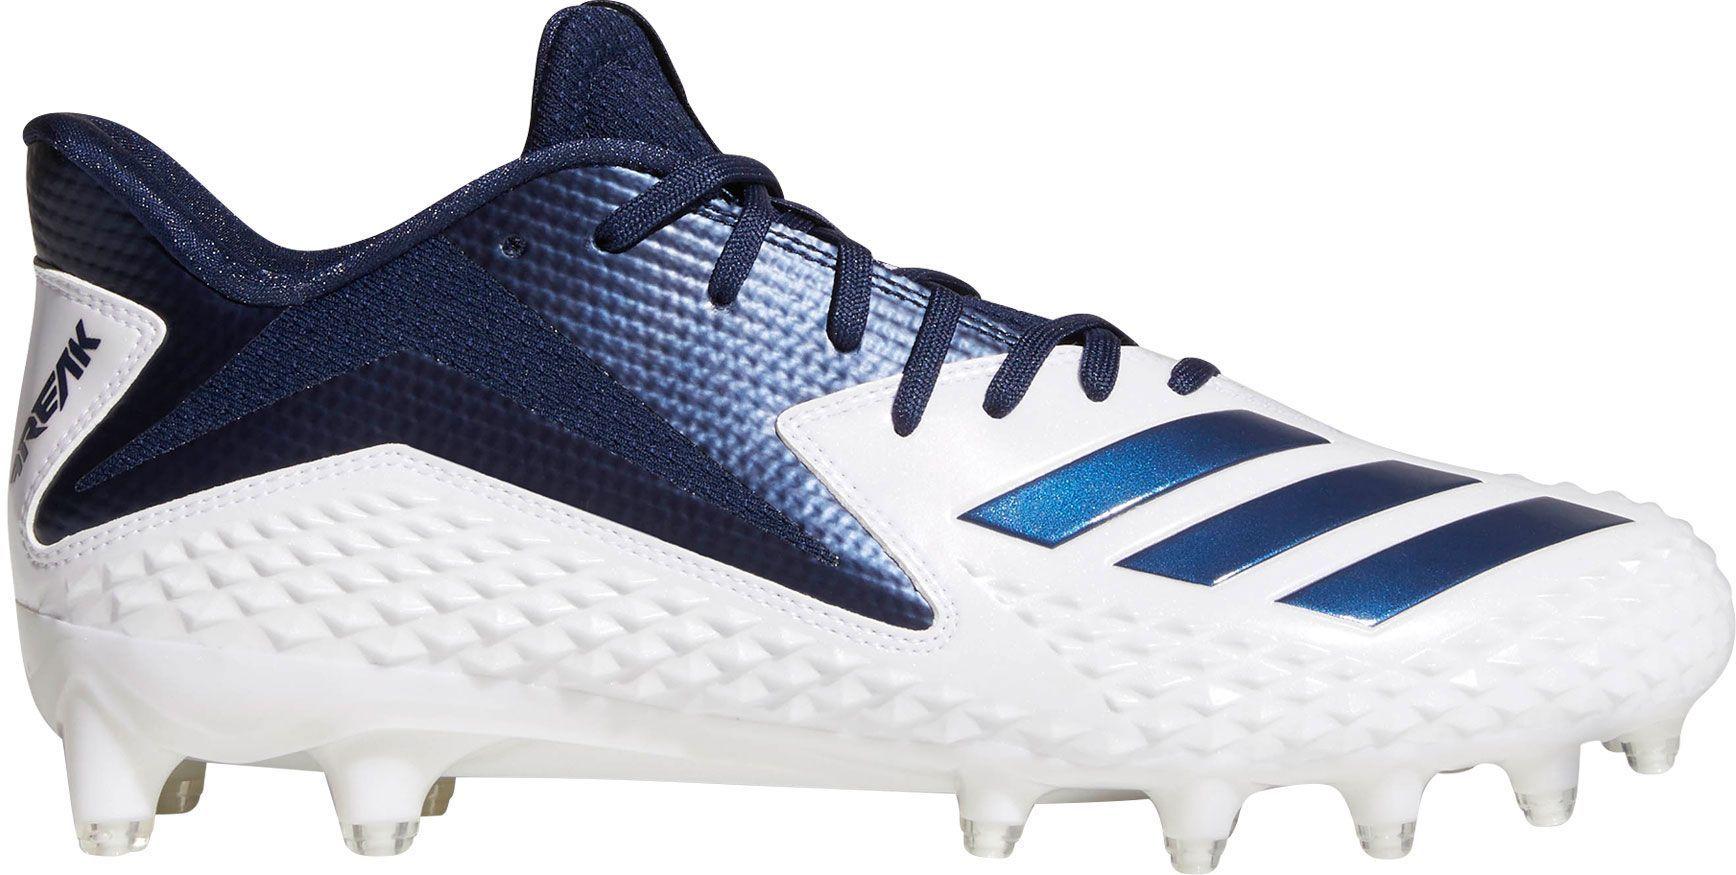 separation shoes 1ab3e ba932 adidas Men s Freak X Carbon Football Cleats, White